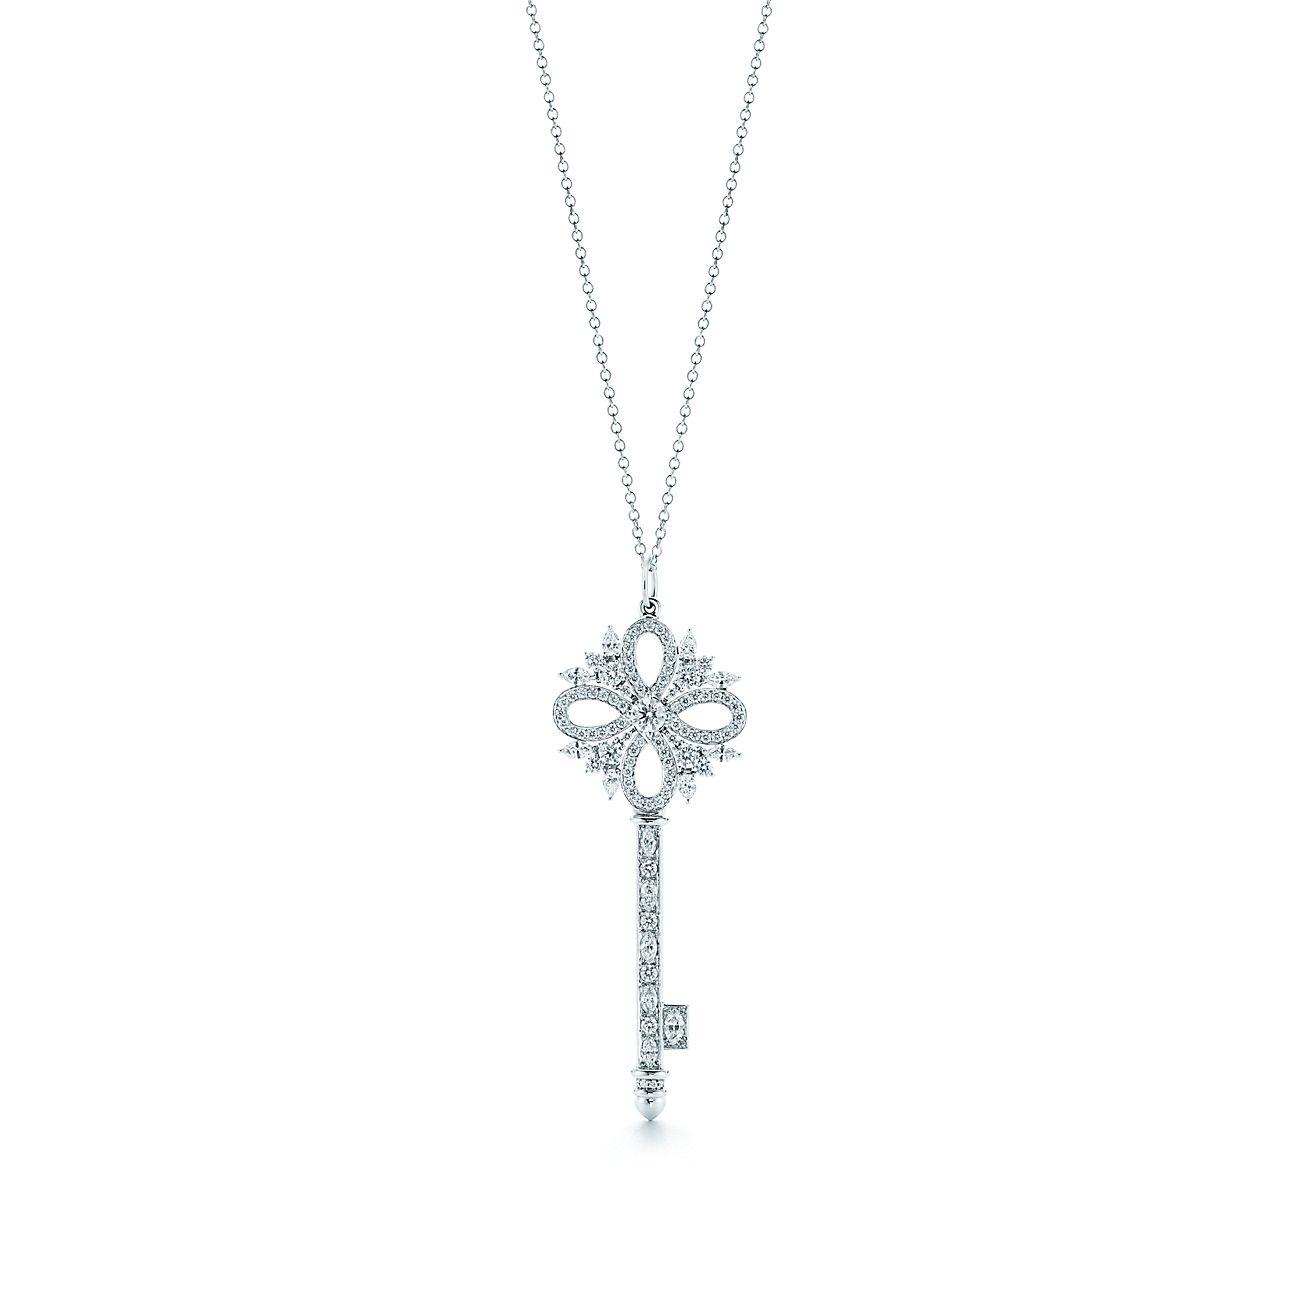 Colgante de llave tiffany keys de tiffany victoria en platino con tiffany keys colgante de llavebrtiffany aloadofball Choice Image